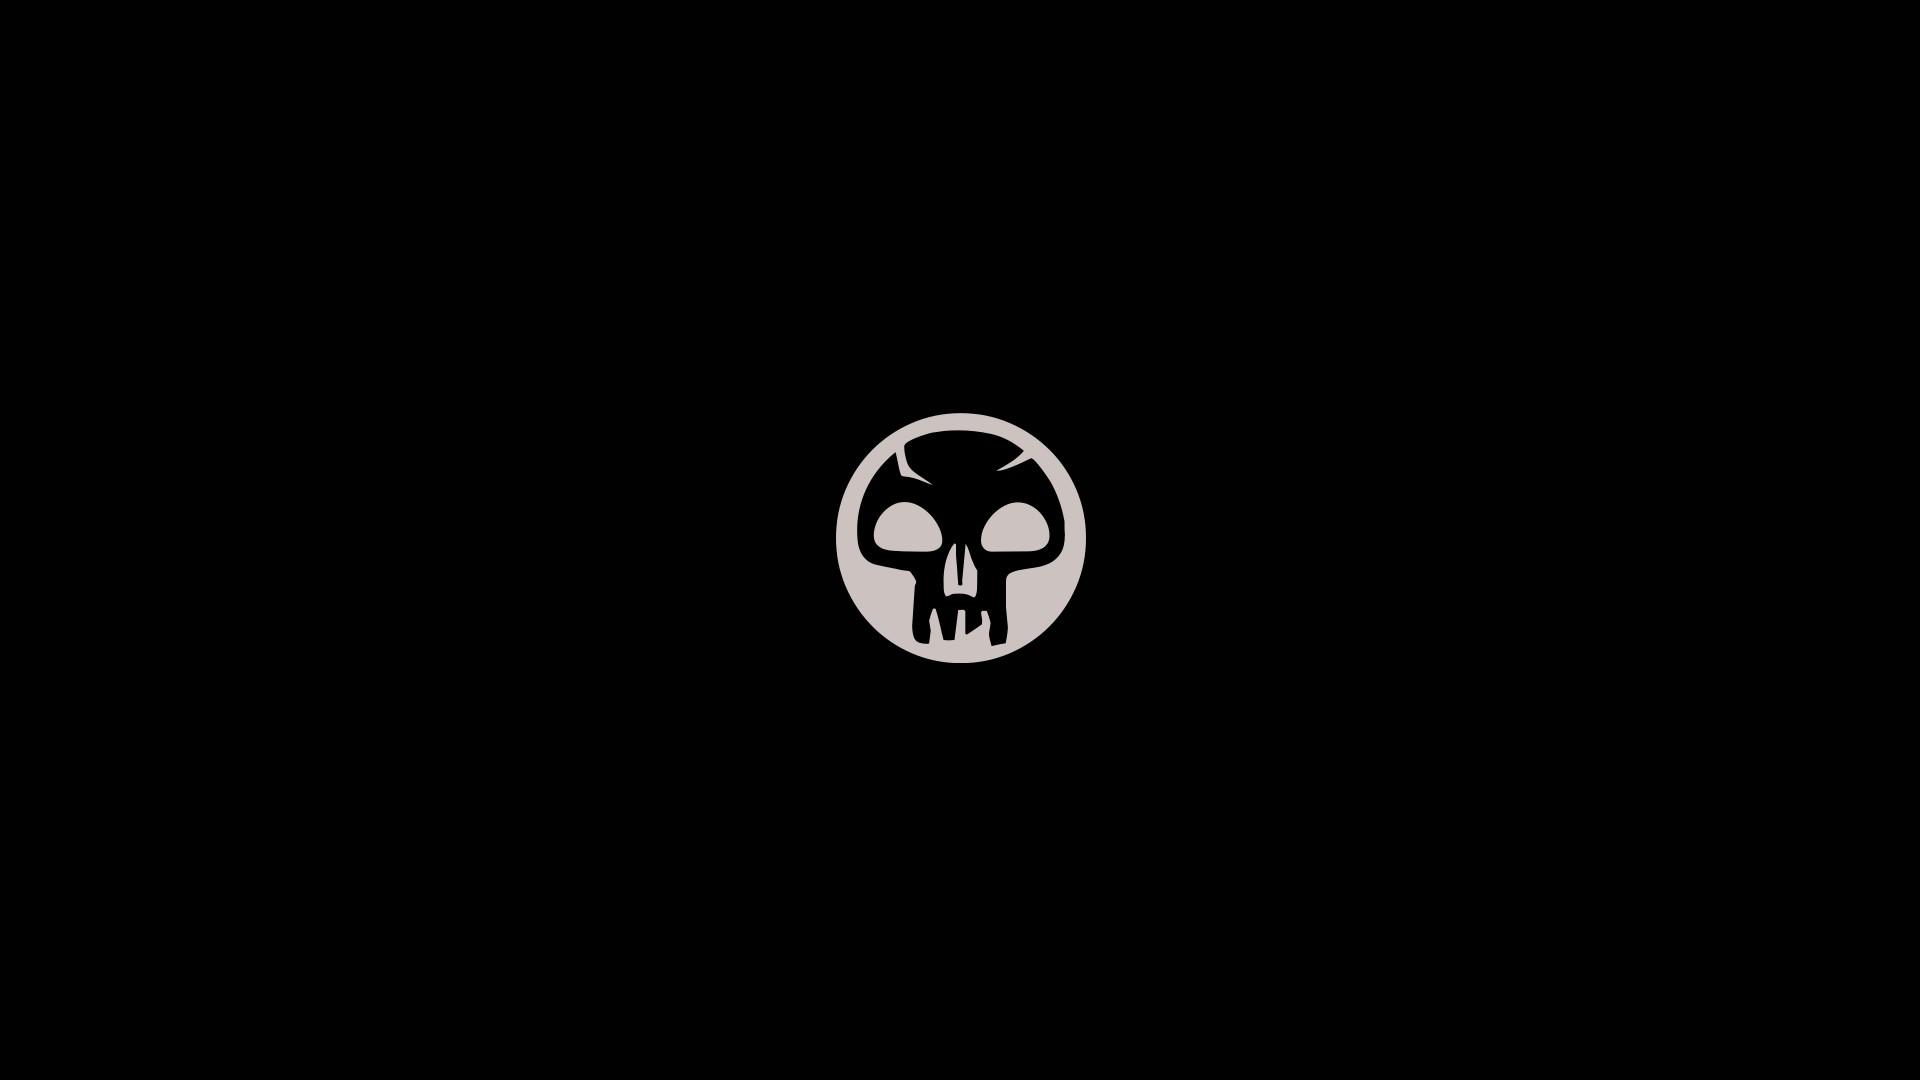 Black Background Minimalism Text Logo Simple Magic The Gathering Circle Skull Brand Trading Card Games Symbol